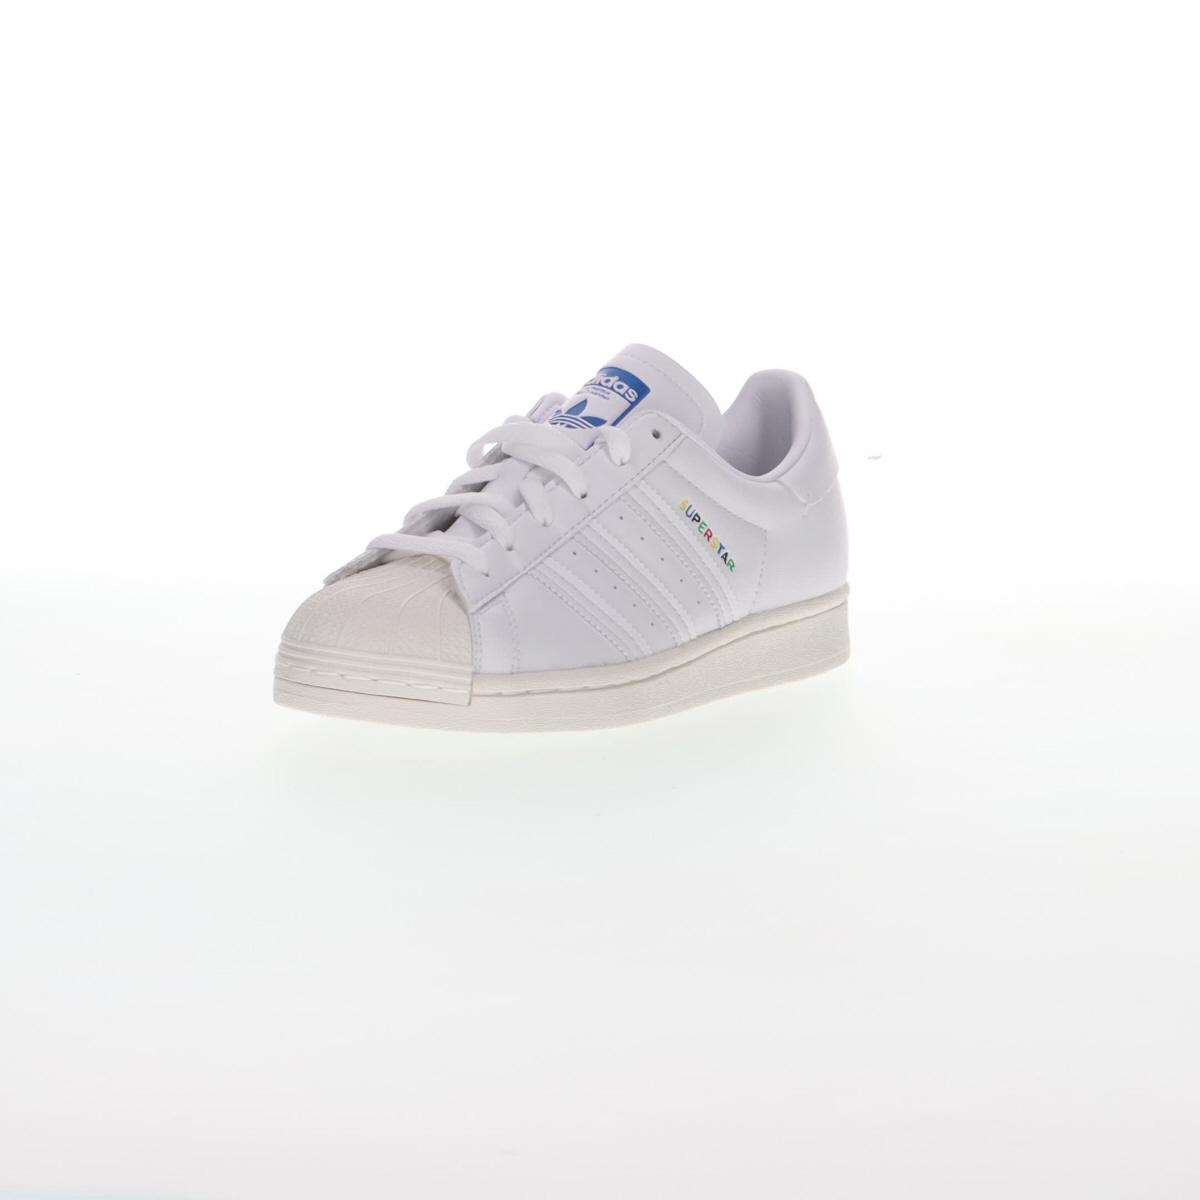 adidas neo advantage white pink blue color scheme